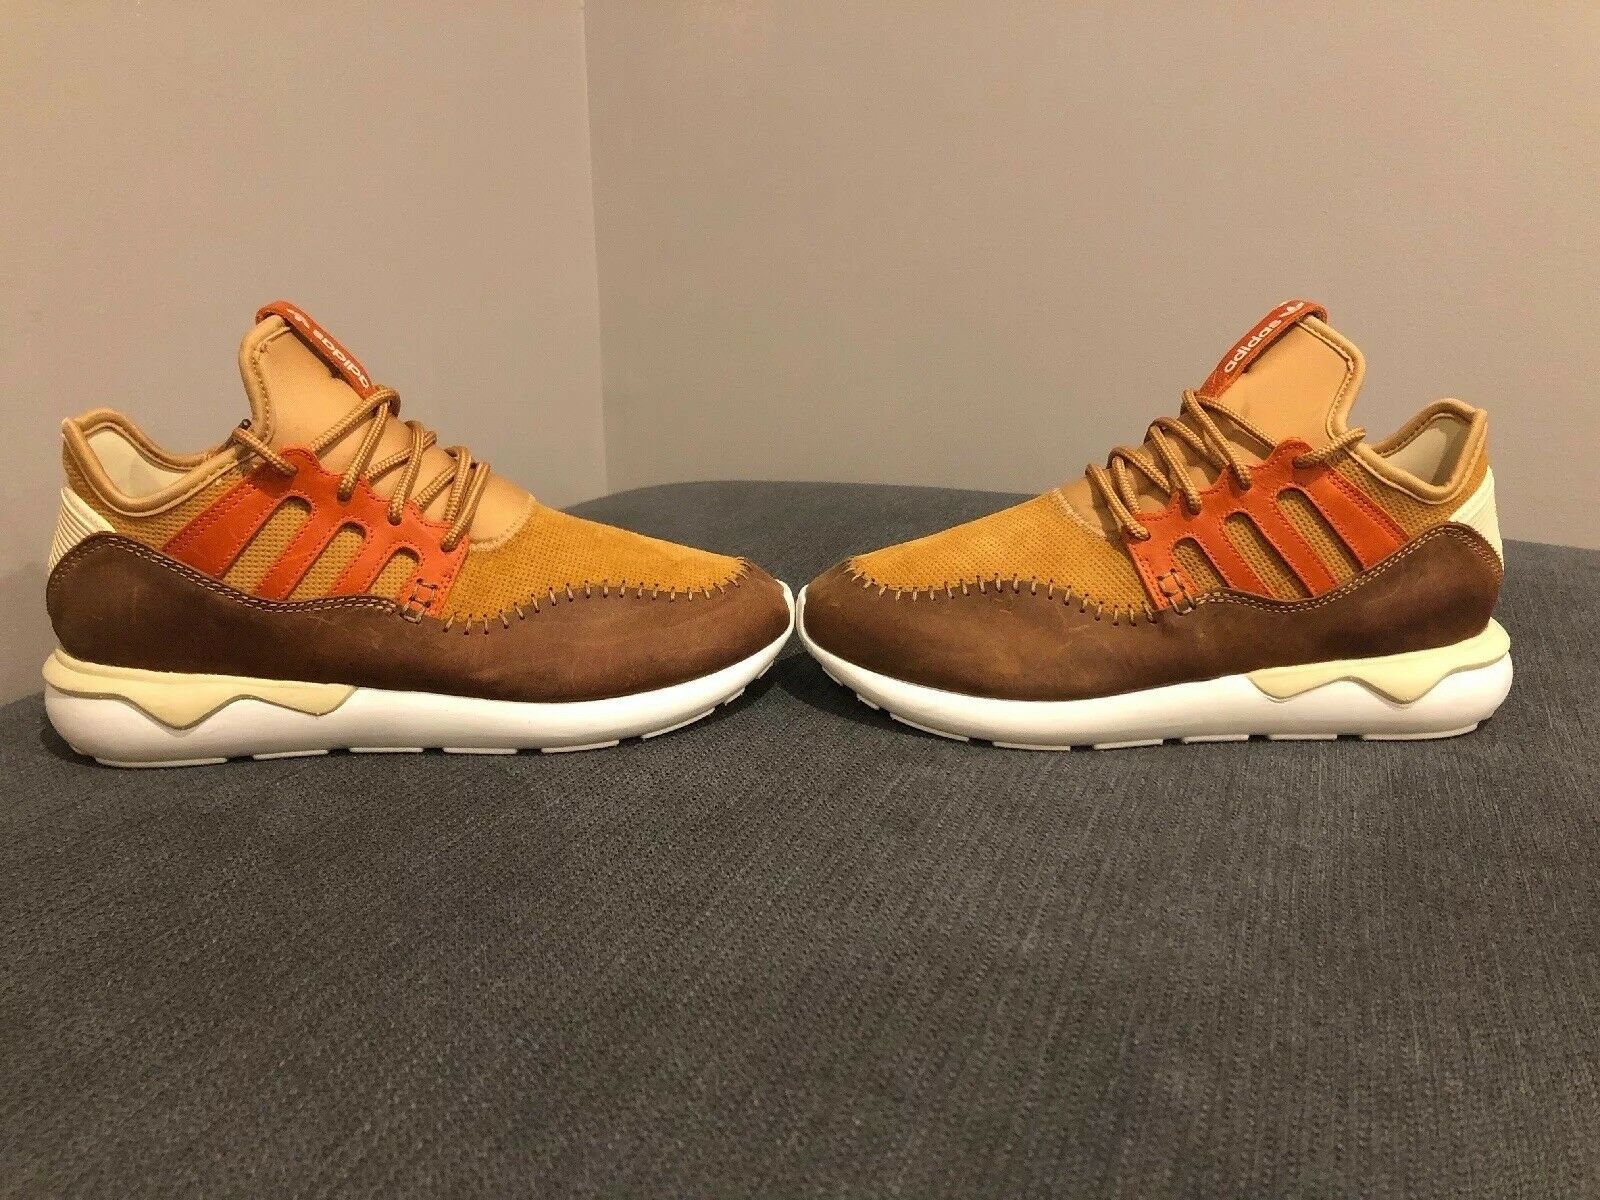 Adidas Tubular Moccasin Moc Runners shoes, Men's Size 10, RARE RARE RARE  0f3bbd